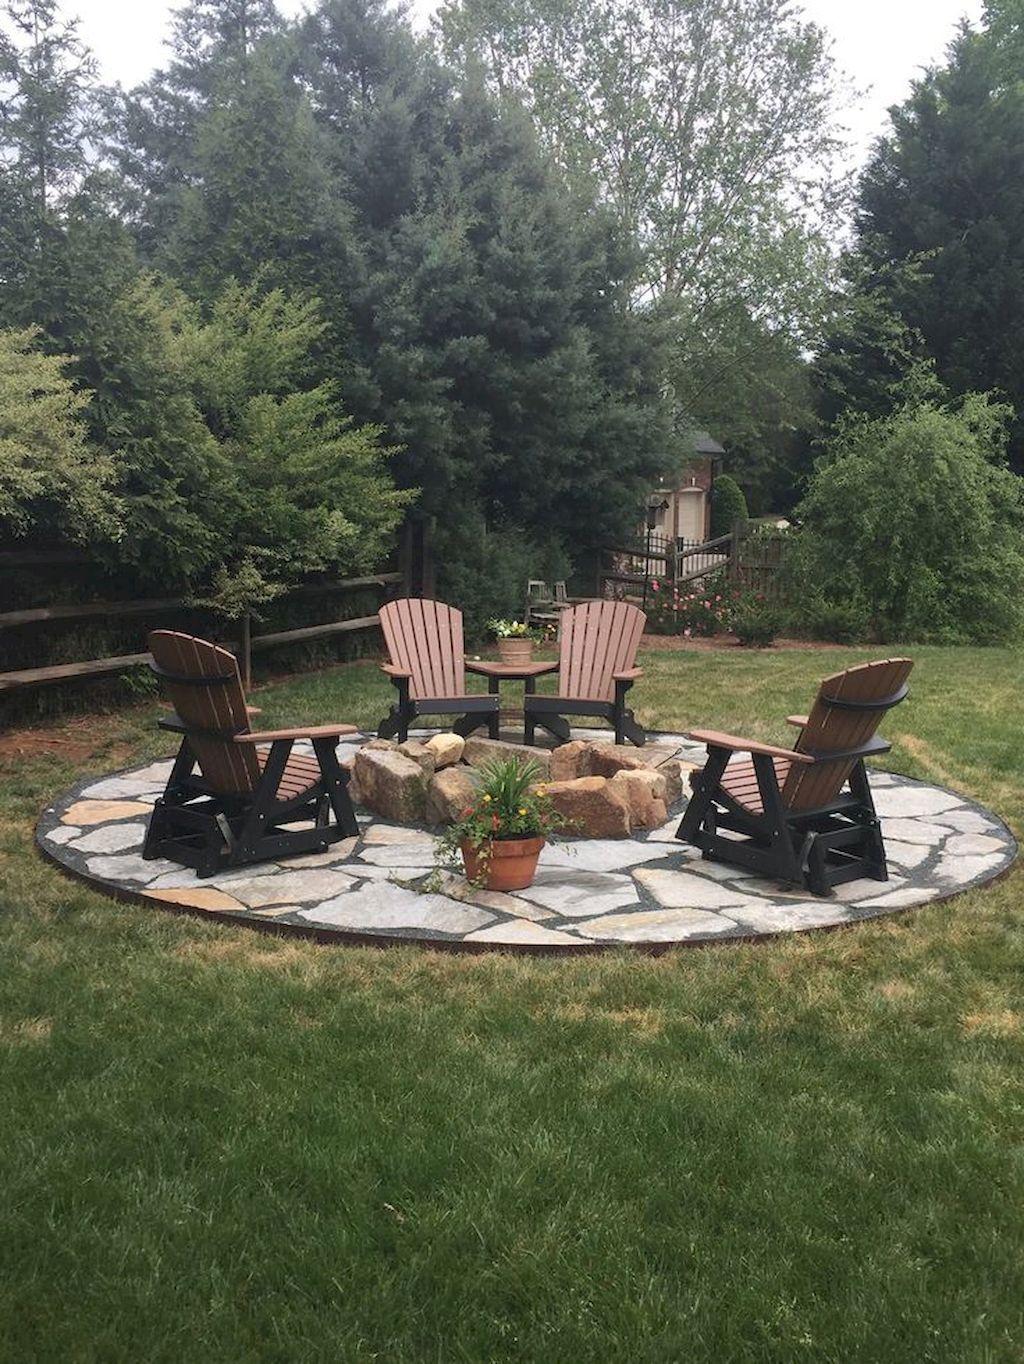 Easy Diy Fire Pit Ideas For Backyard Landscaping 18 Backyard